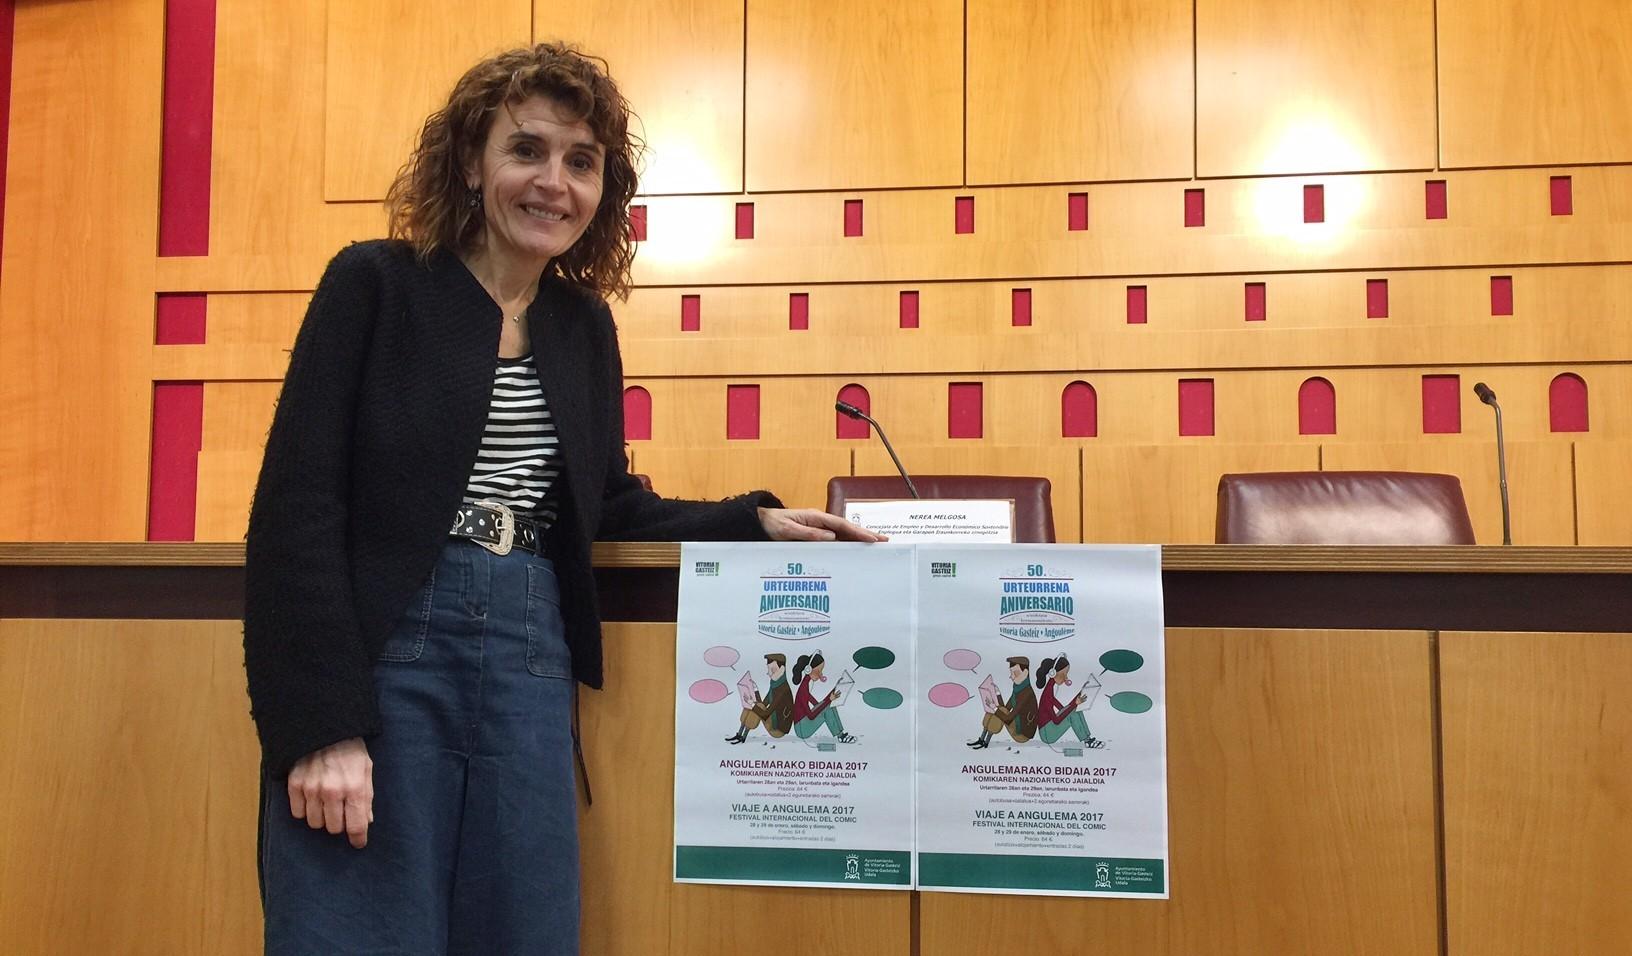 Vitoria gasteiz iniciar la celebraci n del 50 aniversario for Trabajo en vitoria gasteiz